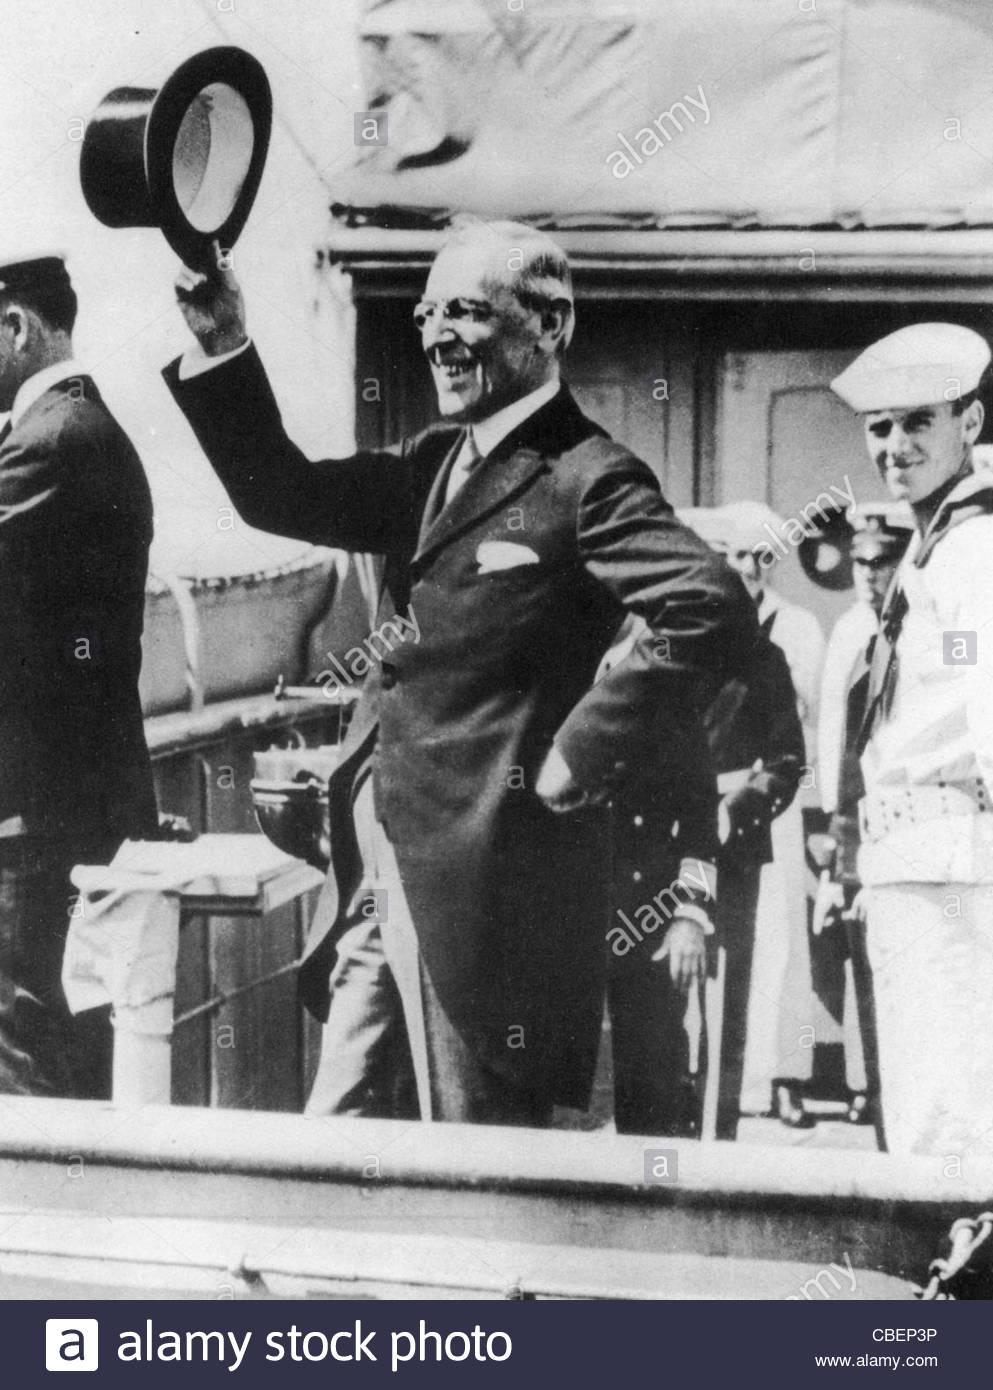 us-president-woodrow-wilson-1856-1924-leaves-new-york-on-the-george-CBEP3P